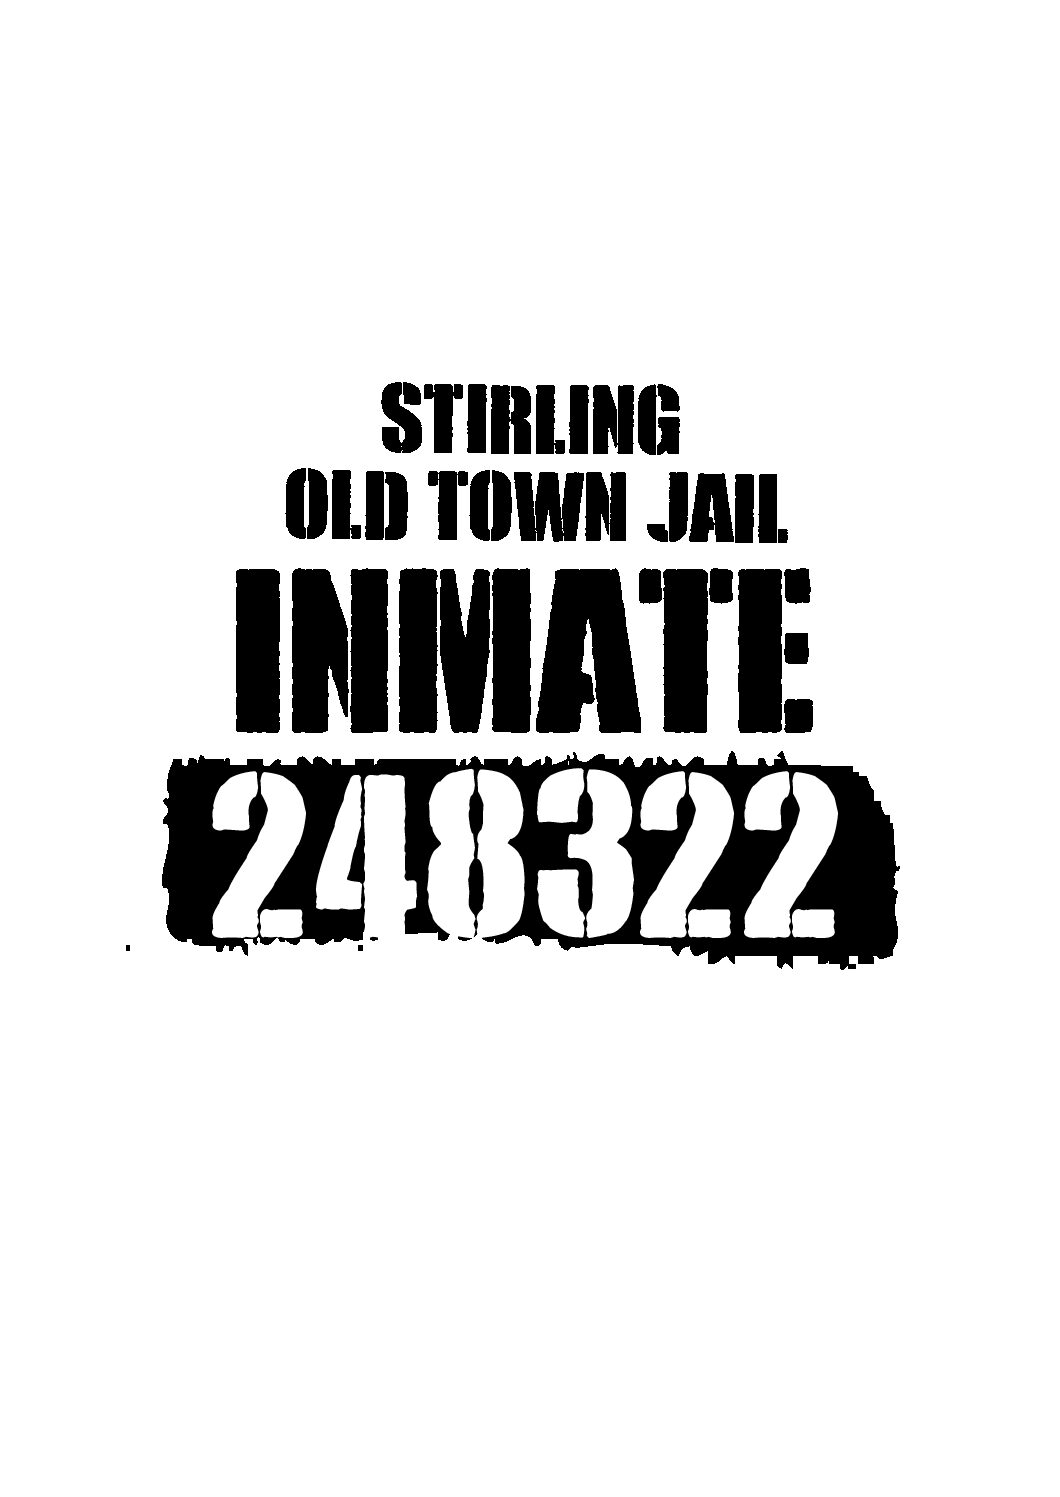 http://oldtownjail.co.uk/wp-content/uploads/2021/03/Inmate-Number-Tee-pdf.jpg